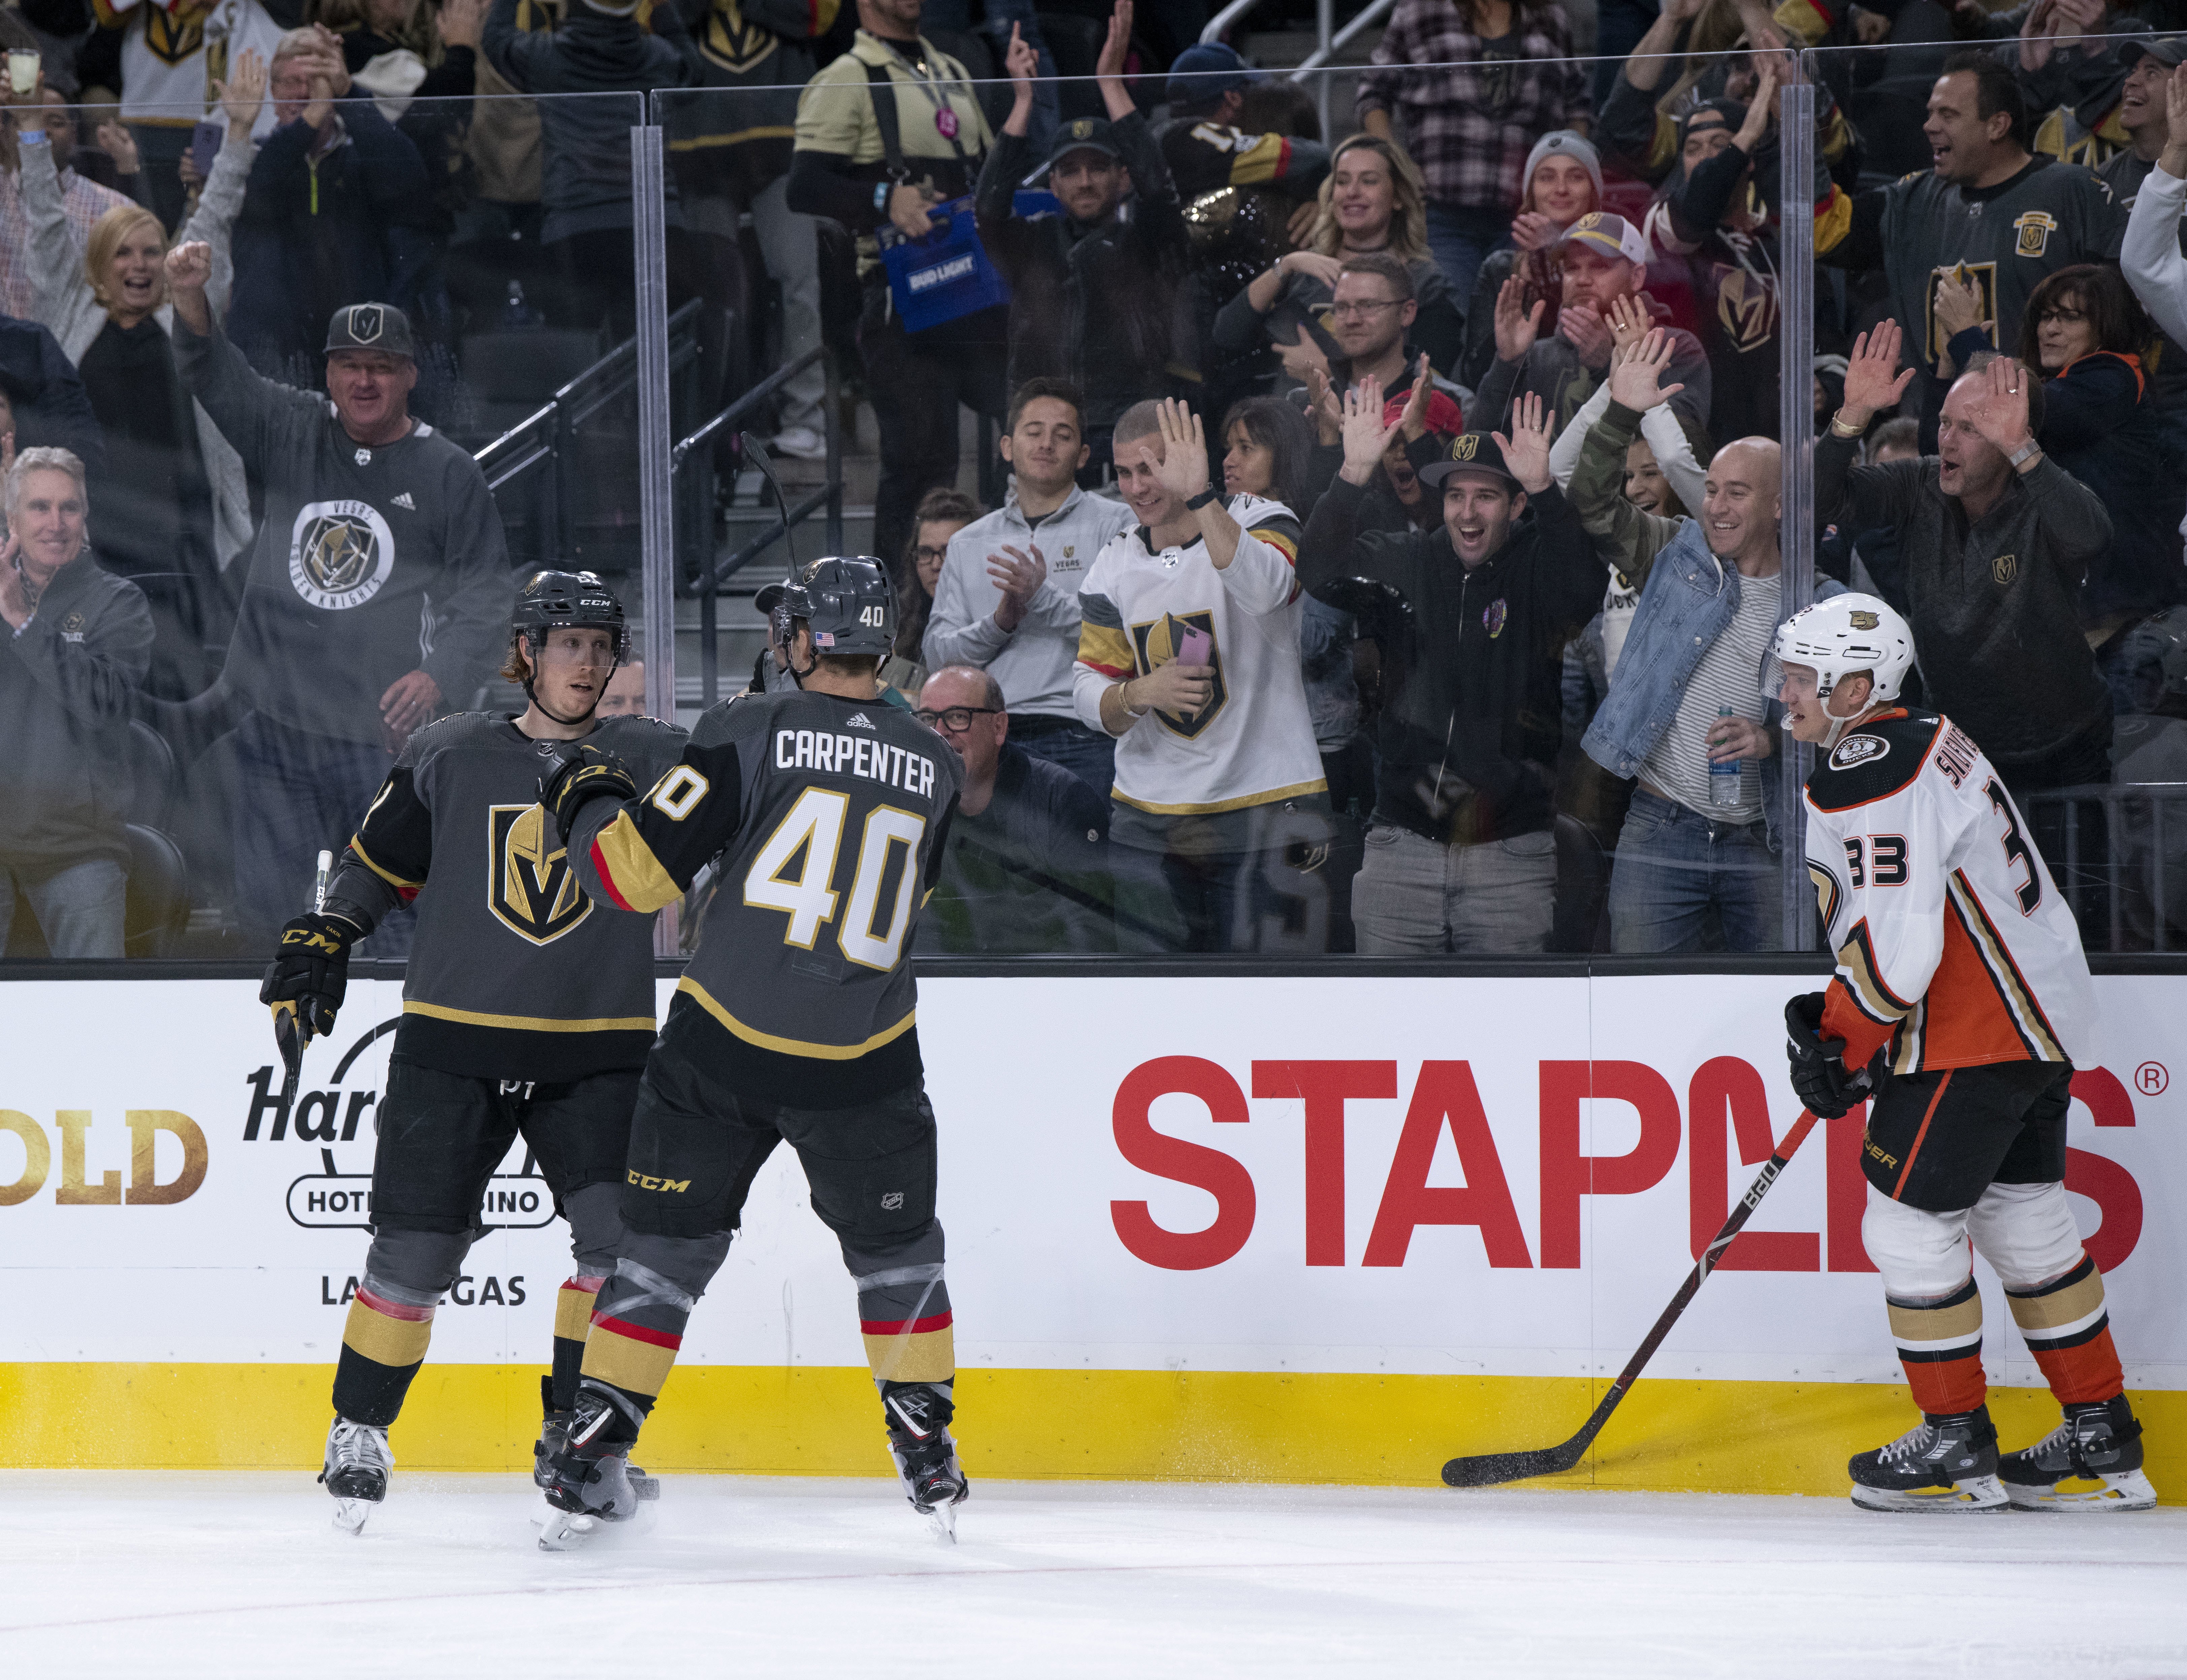 Eakin scores 2, Fleury gets shutout as Vegas beats Ducks 5-0